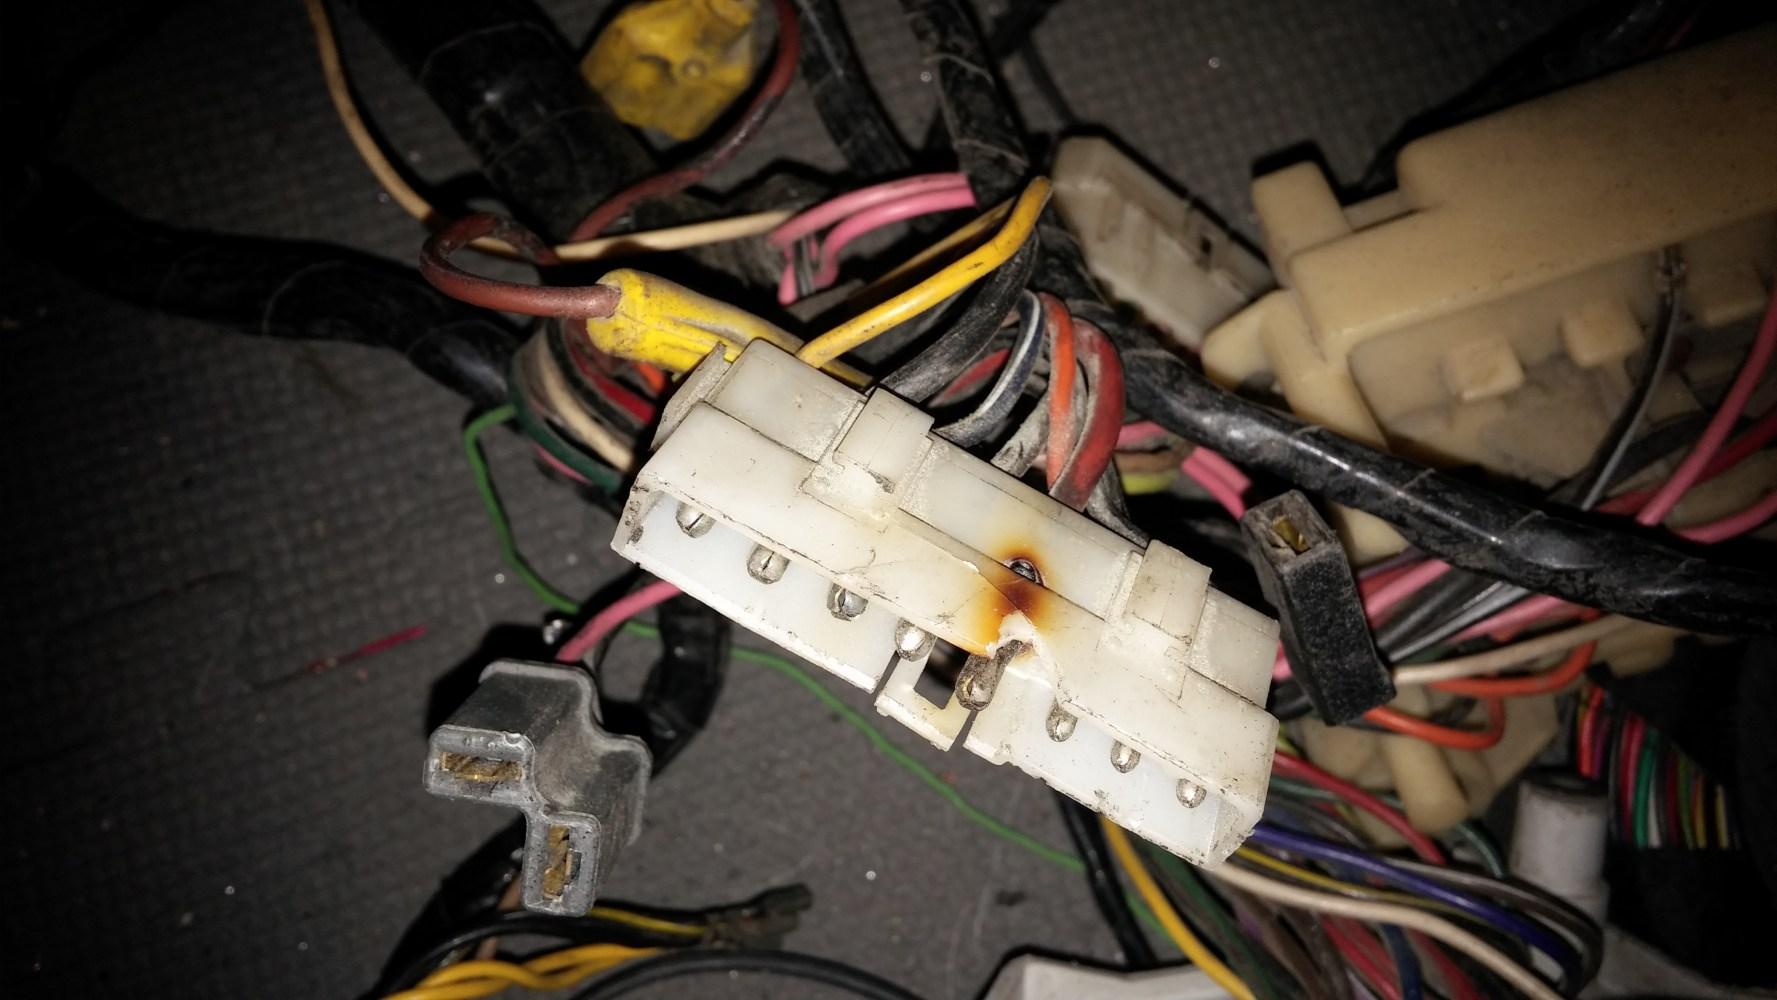 medium resolution of restoration troubleshooting and custom car wiring in bend oregon automotive wiring harness repair